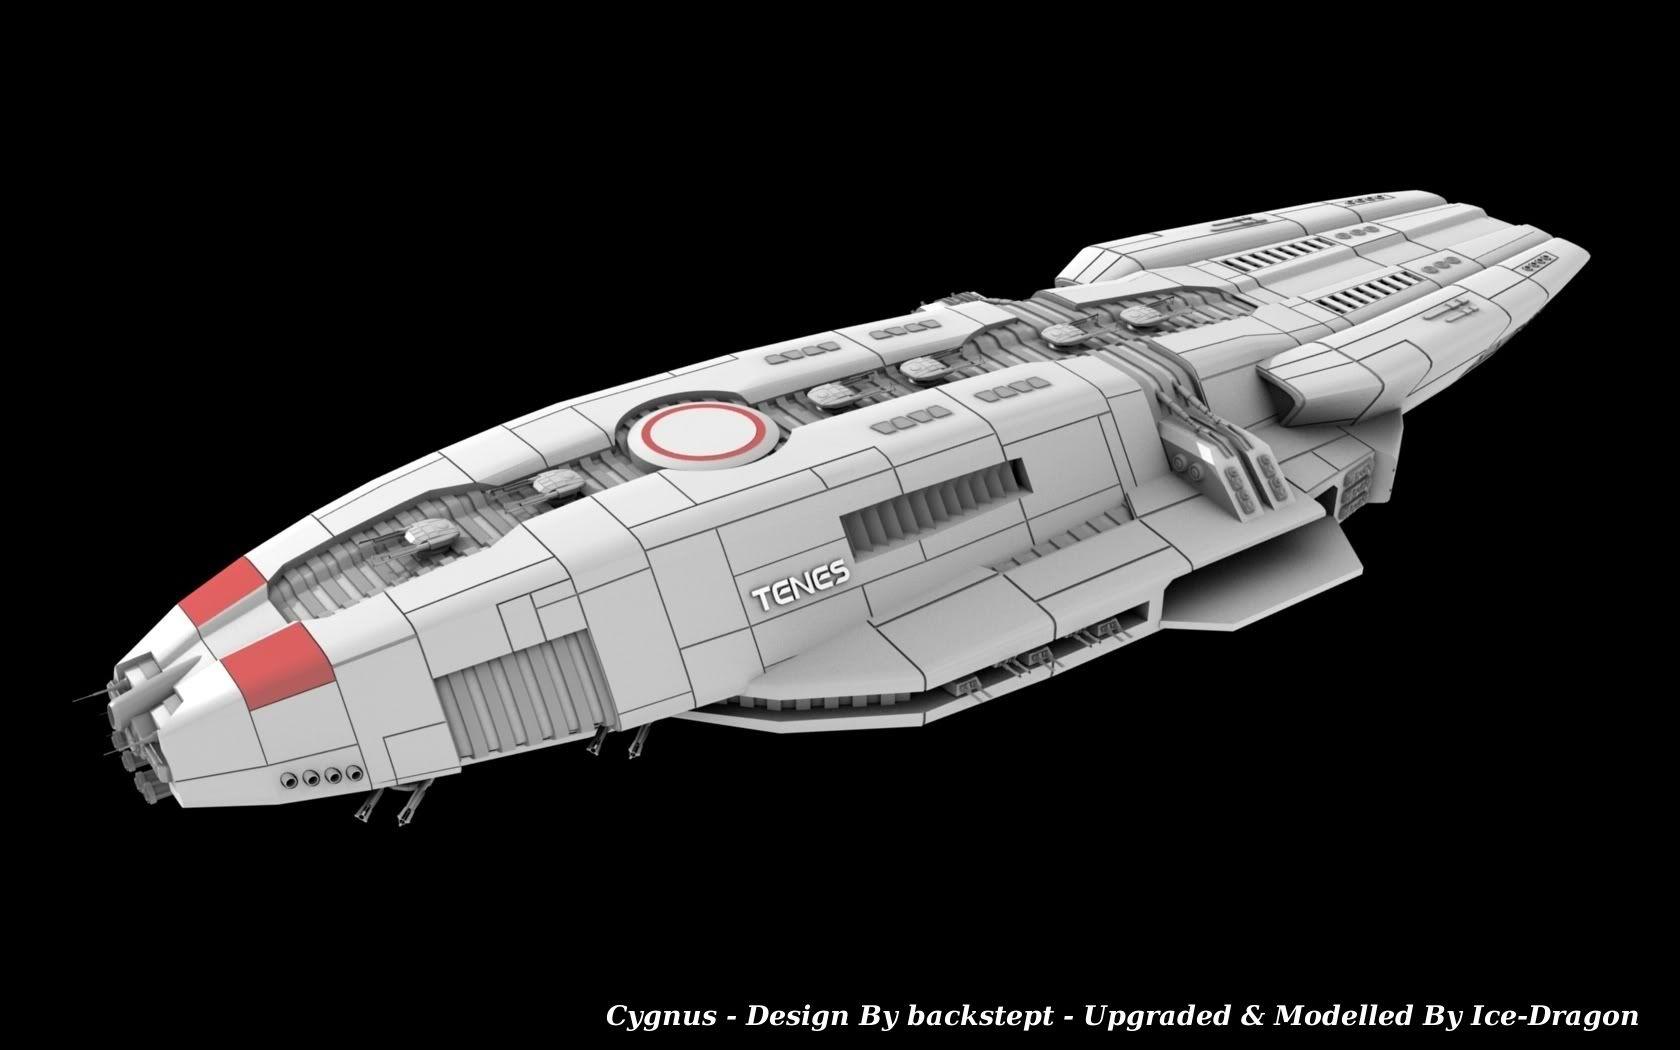 Pin By Scott Koch On Asgardia Iii Spaceship Battlestar Galactica